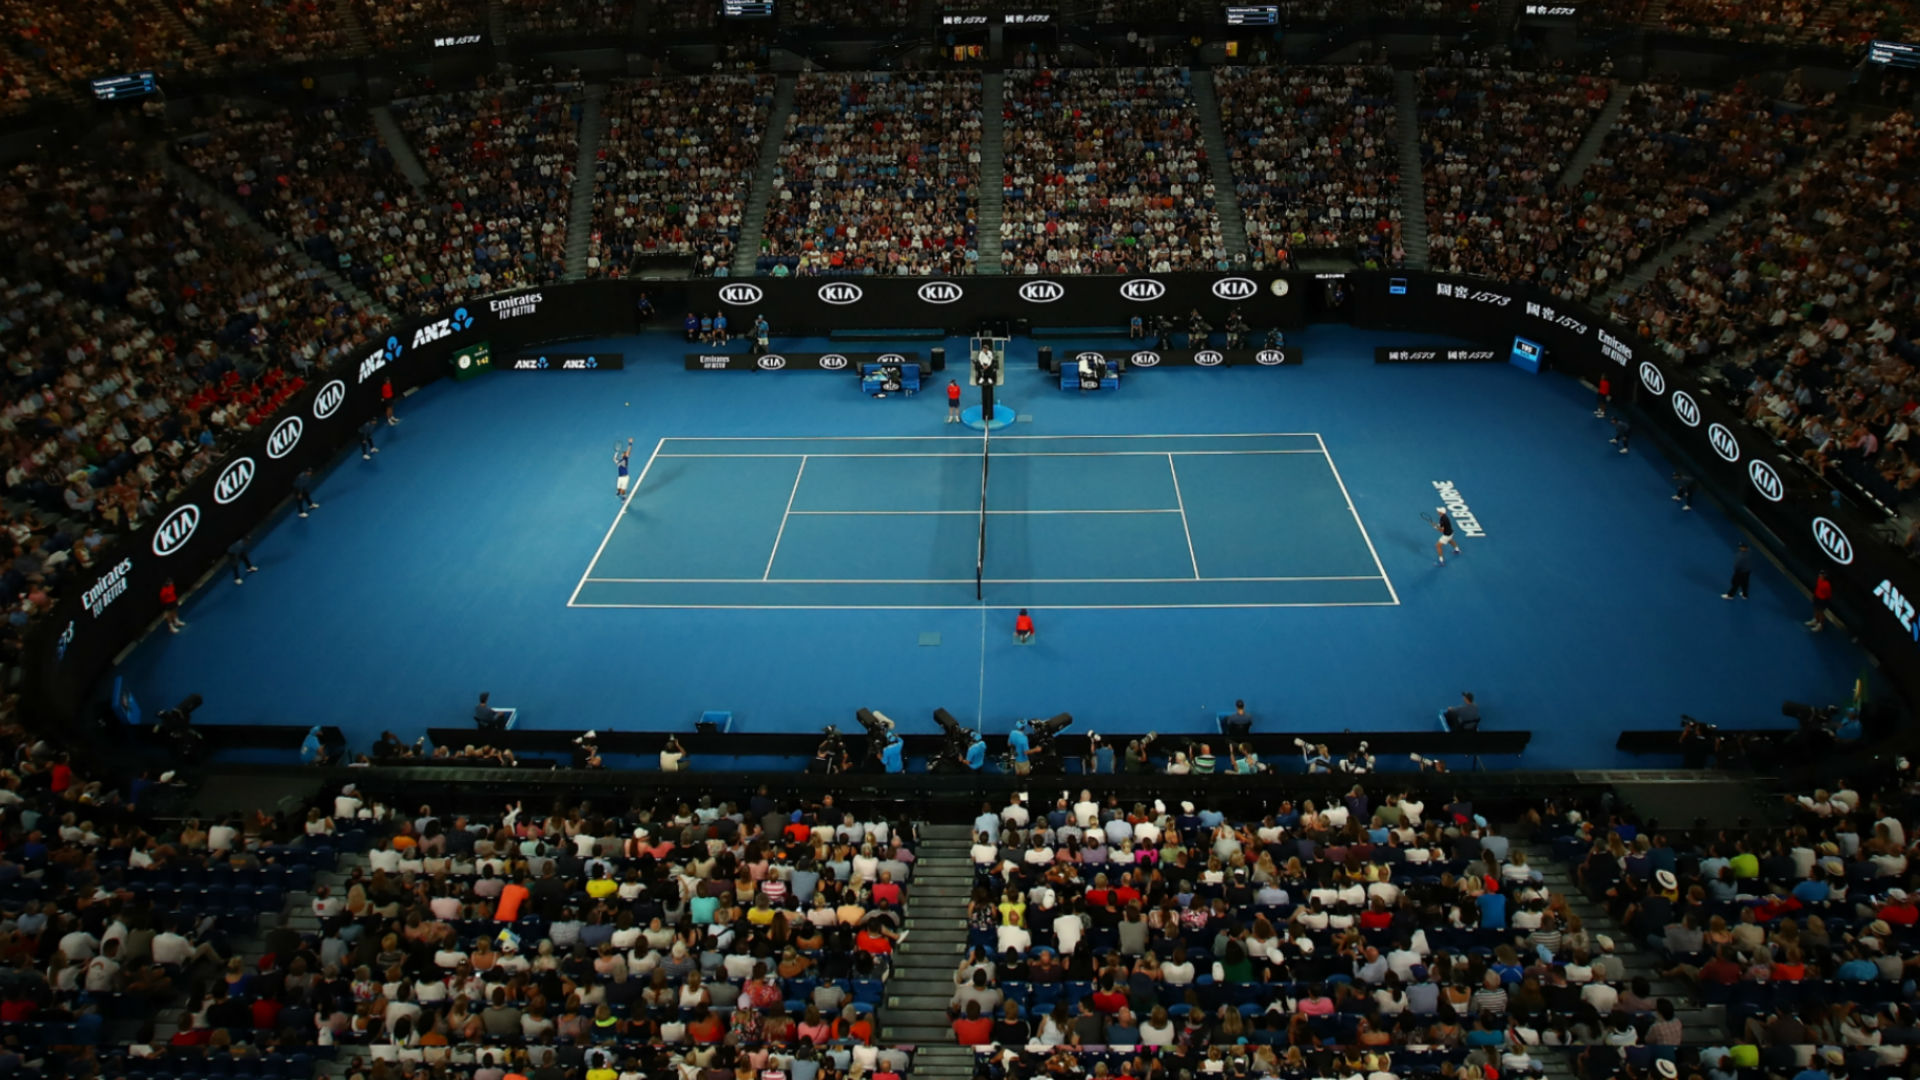 australian open 2019  live results  scores from men u0026 39 s  women u0026 39 s championships